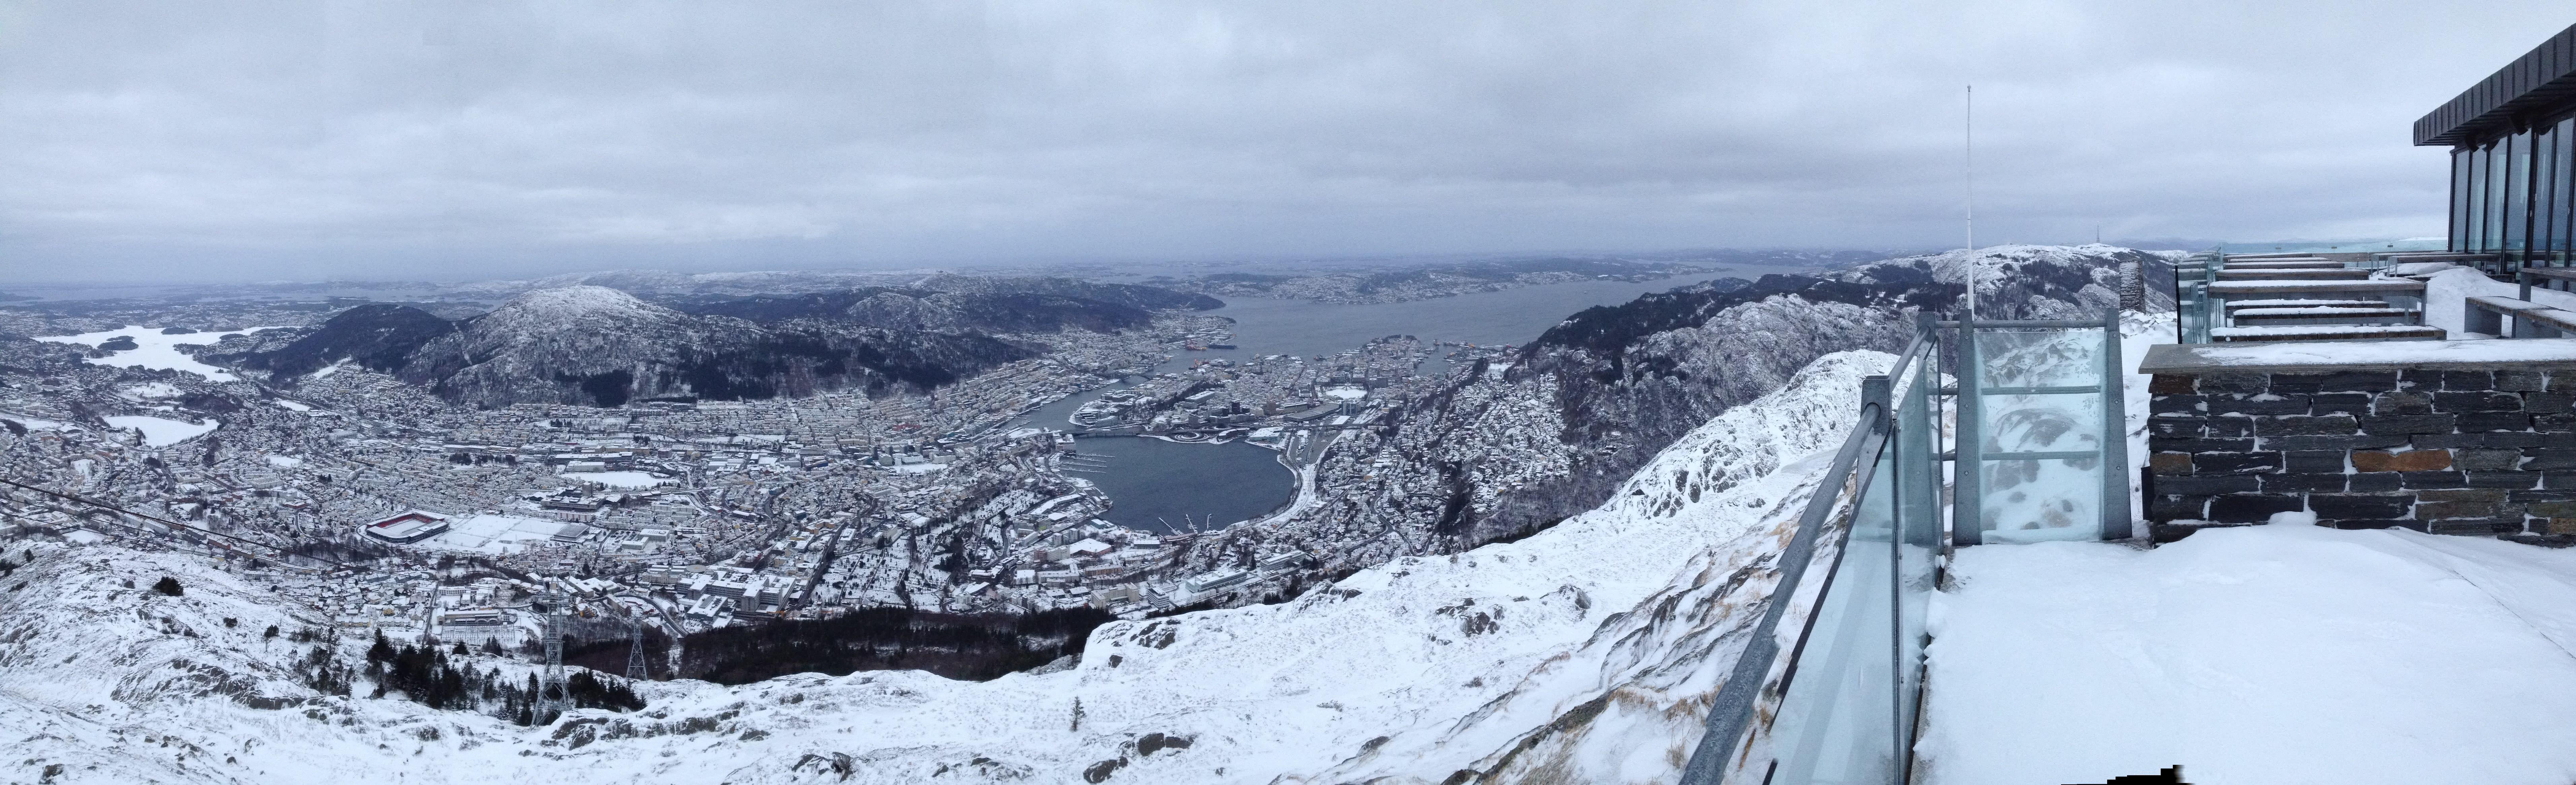 ulriken panorama bergen